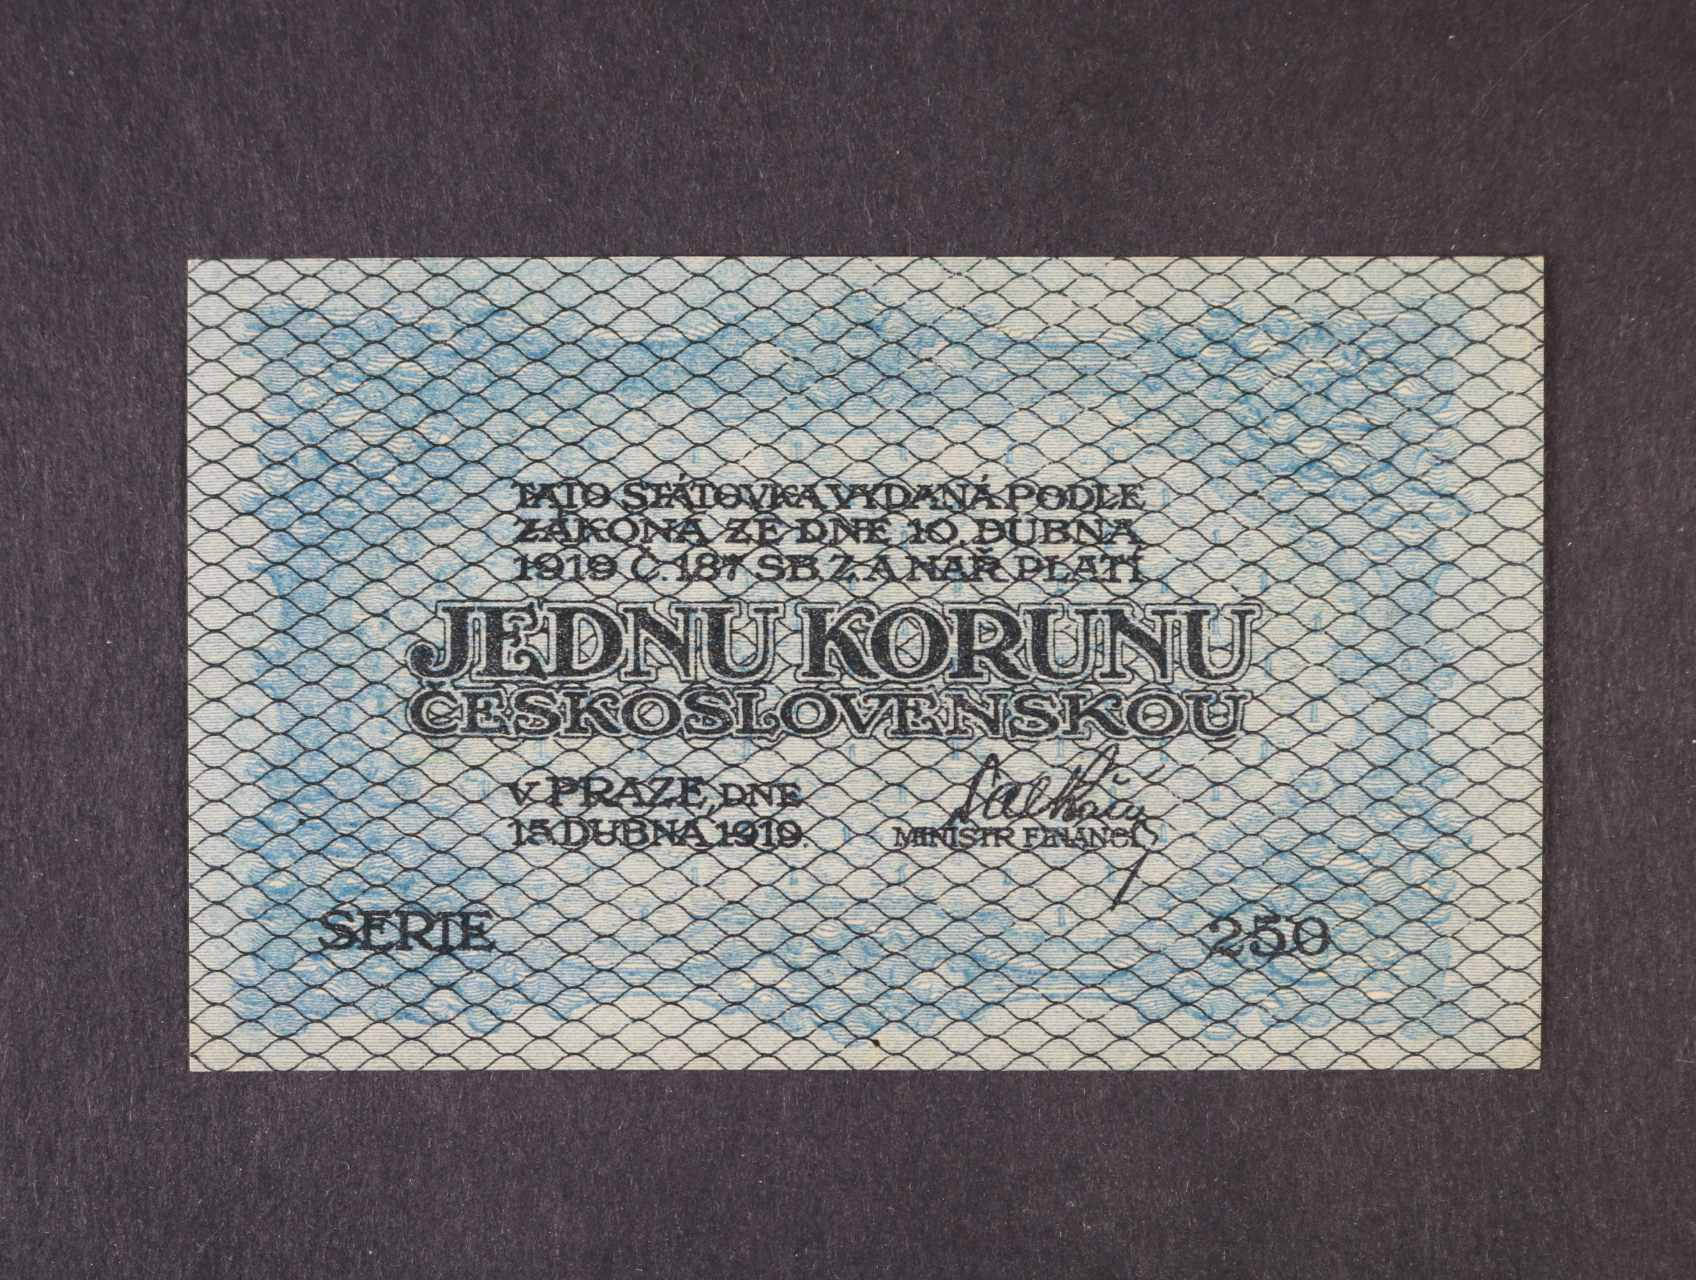 1 Kč 15.4.1919 série 250, modro zelená, Ba. 7, Pi. 6a